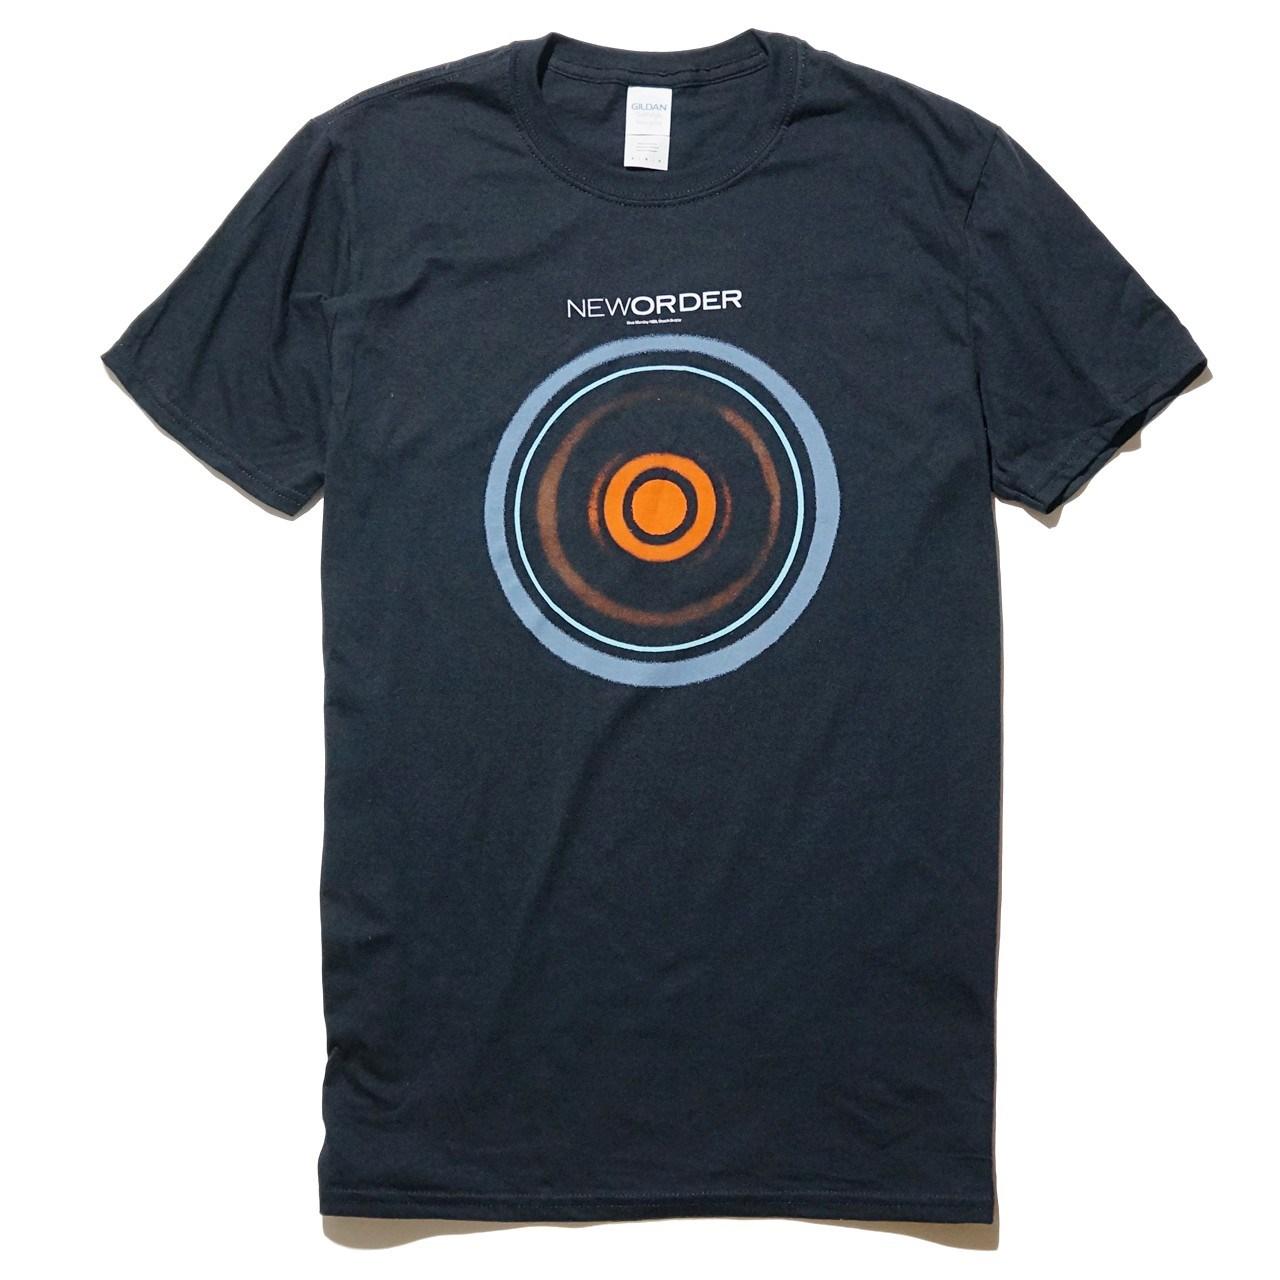 NEW ORDER Tシャツ 公式 Blue Monday 88-Black